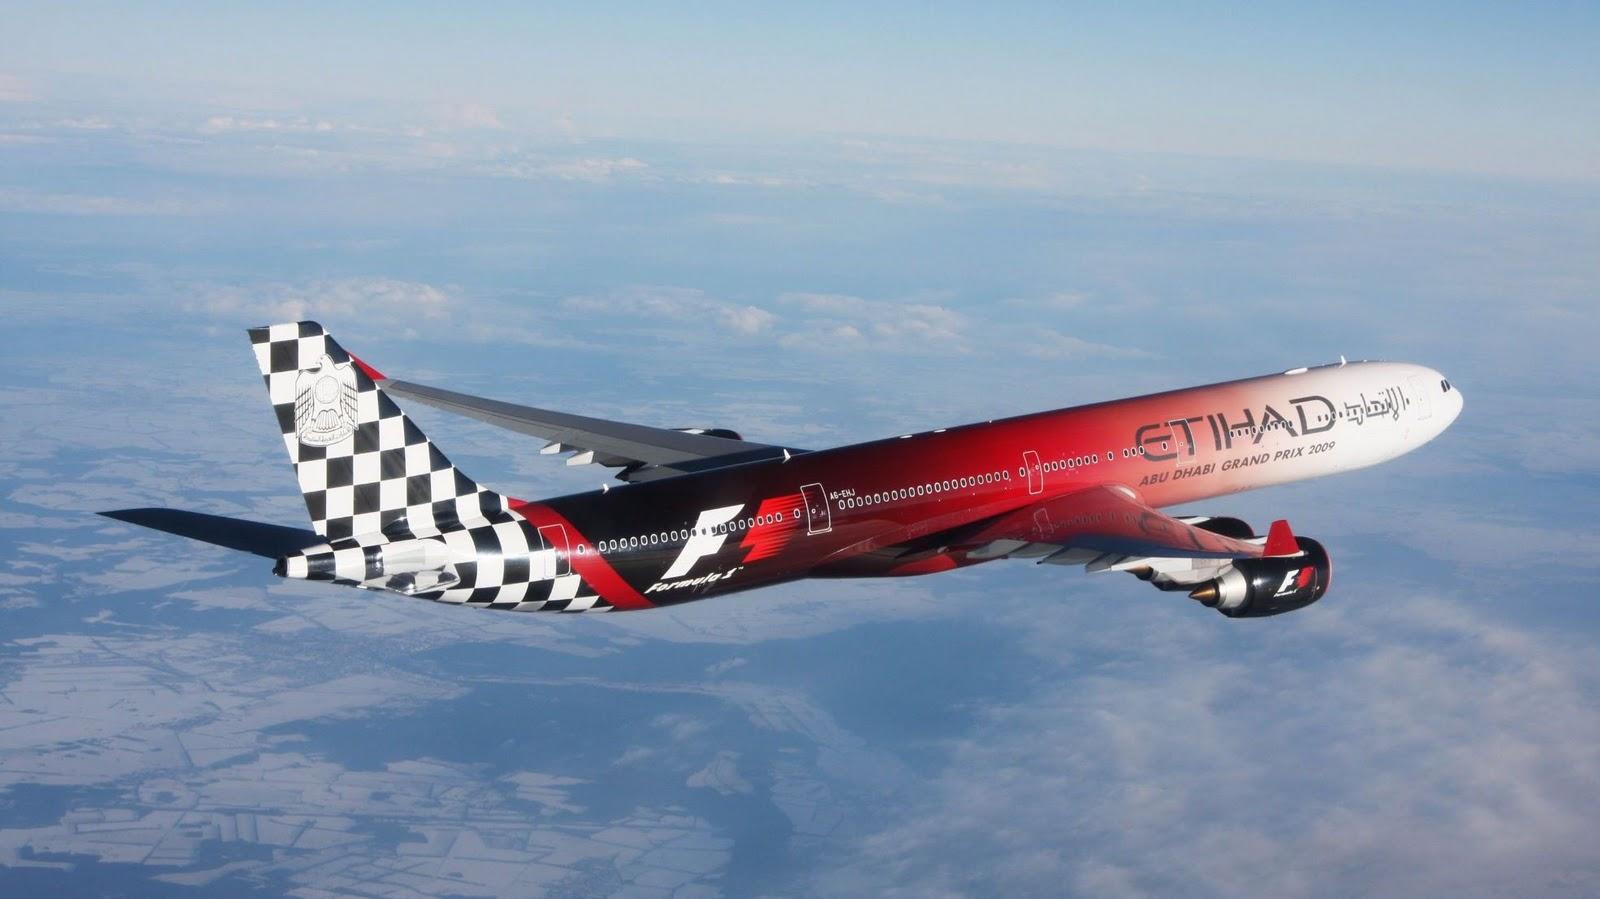 Rc Airplane Wallpaper 1600x899